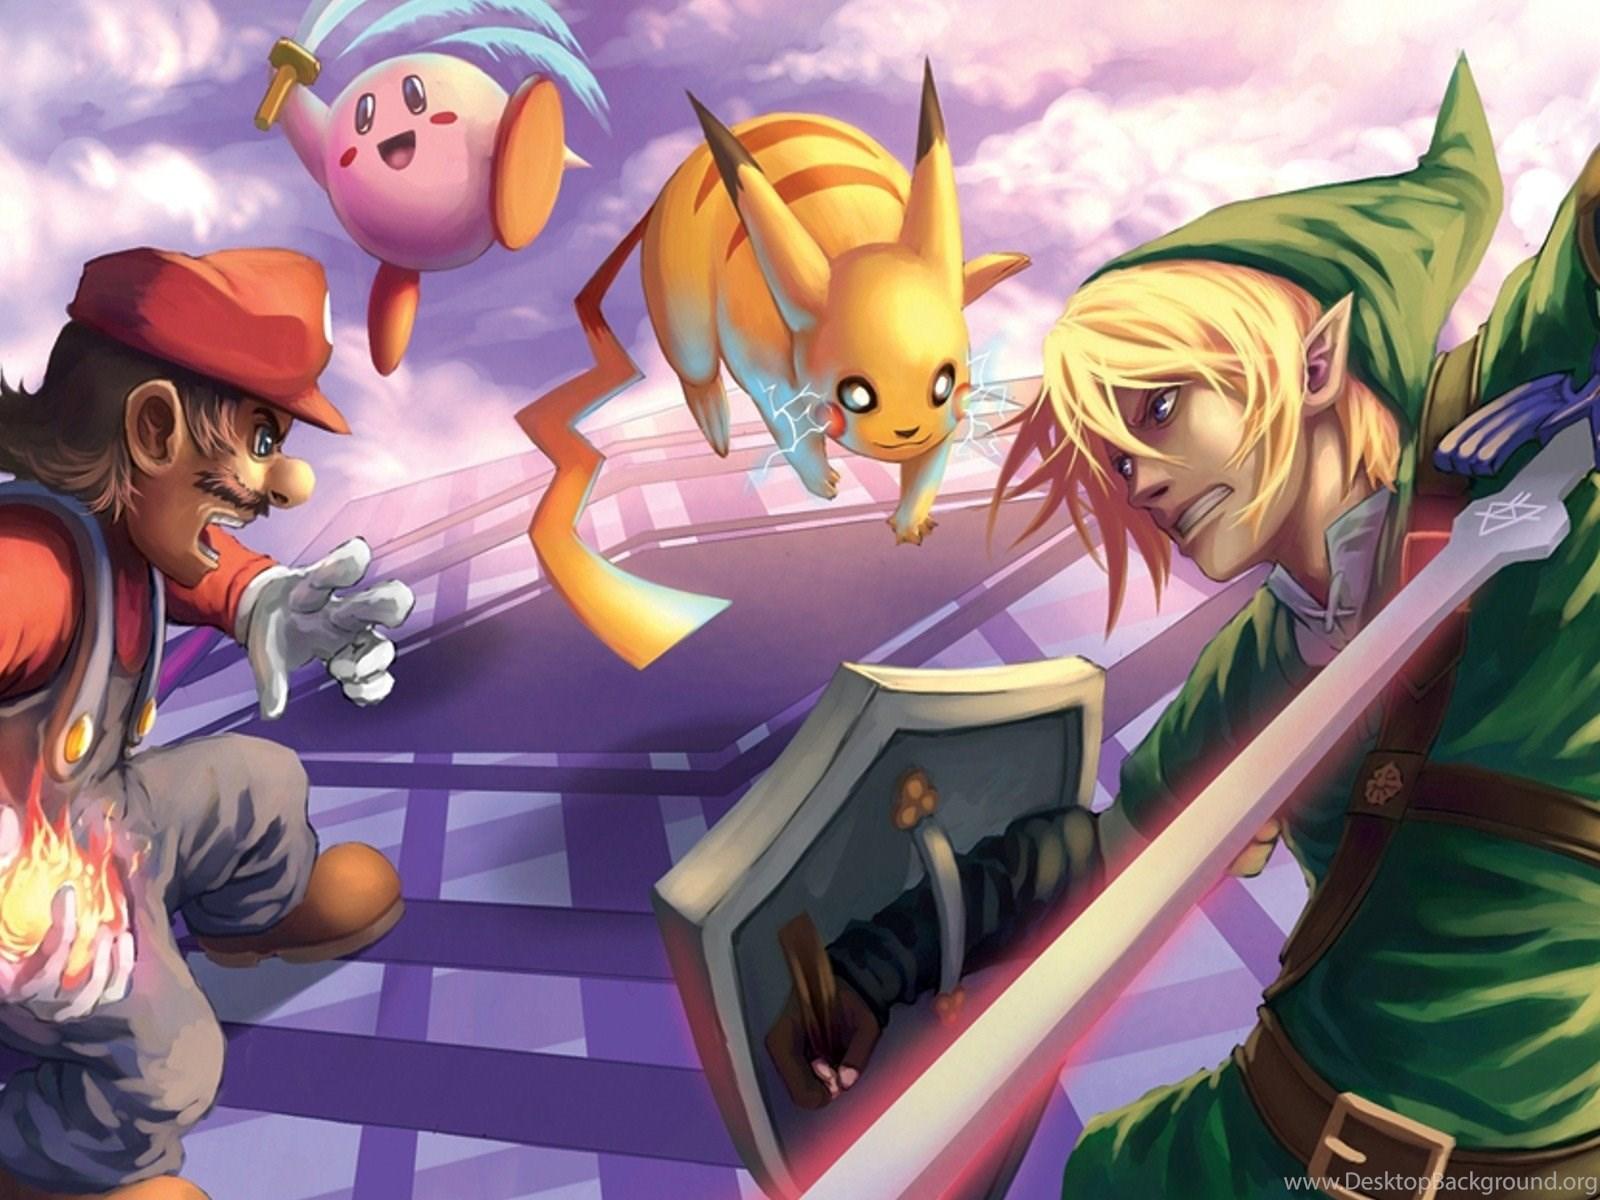 Fonds D Ecran Super Smash Bros Tous Les Wallpapers Super Smash